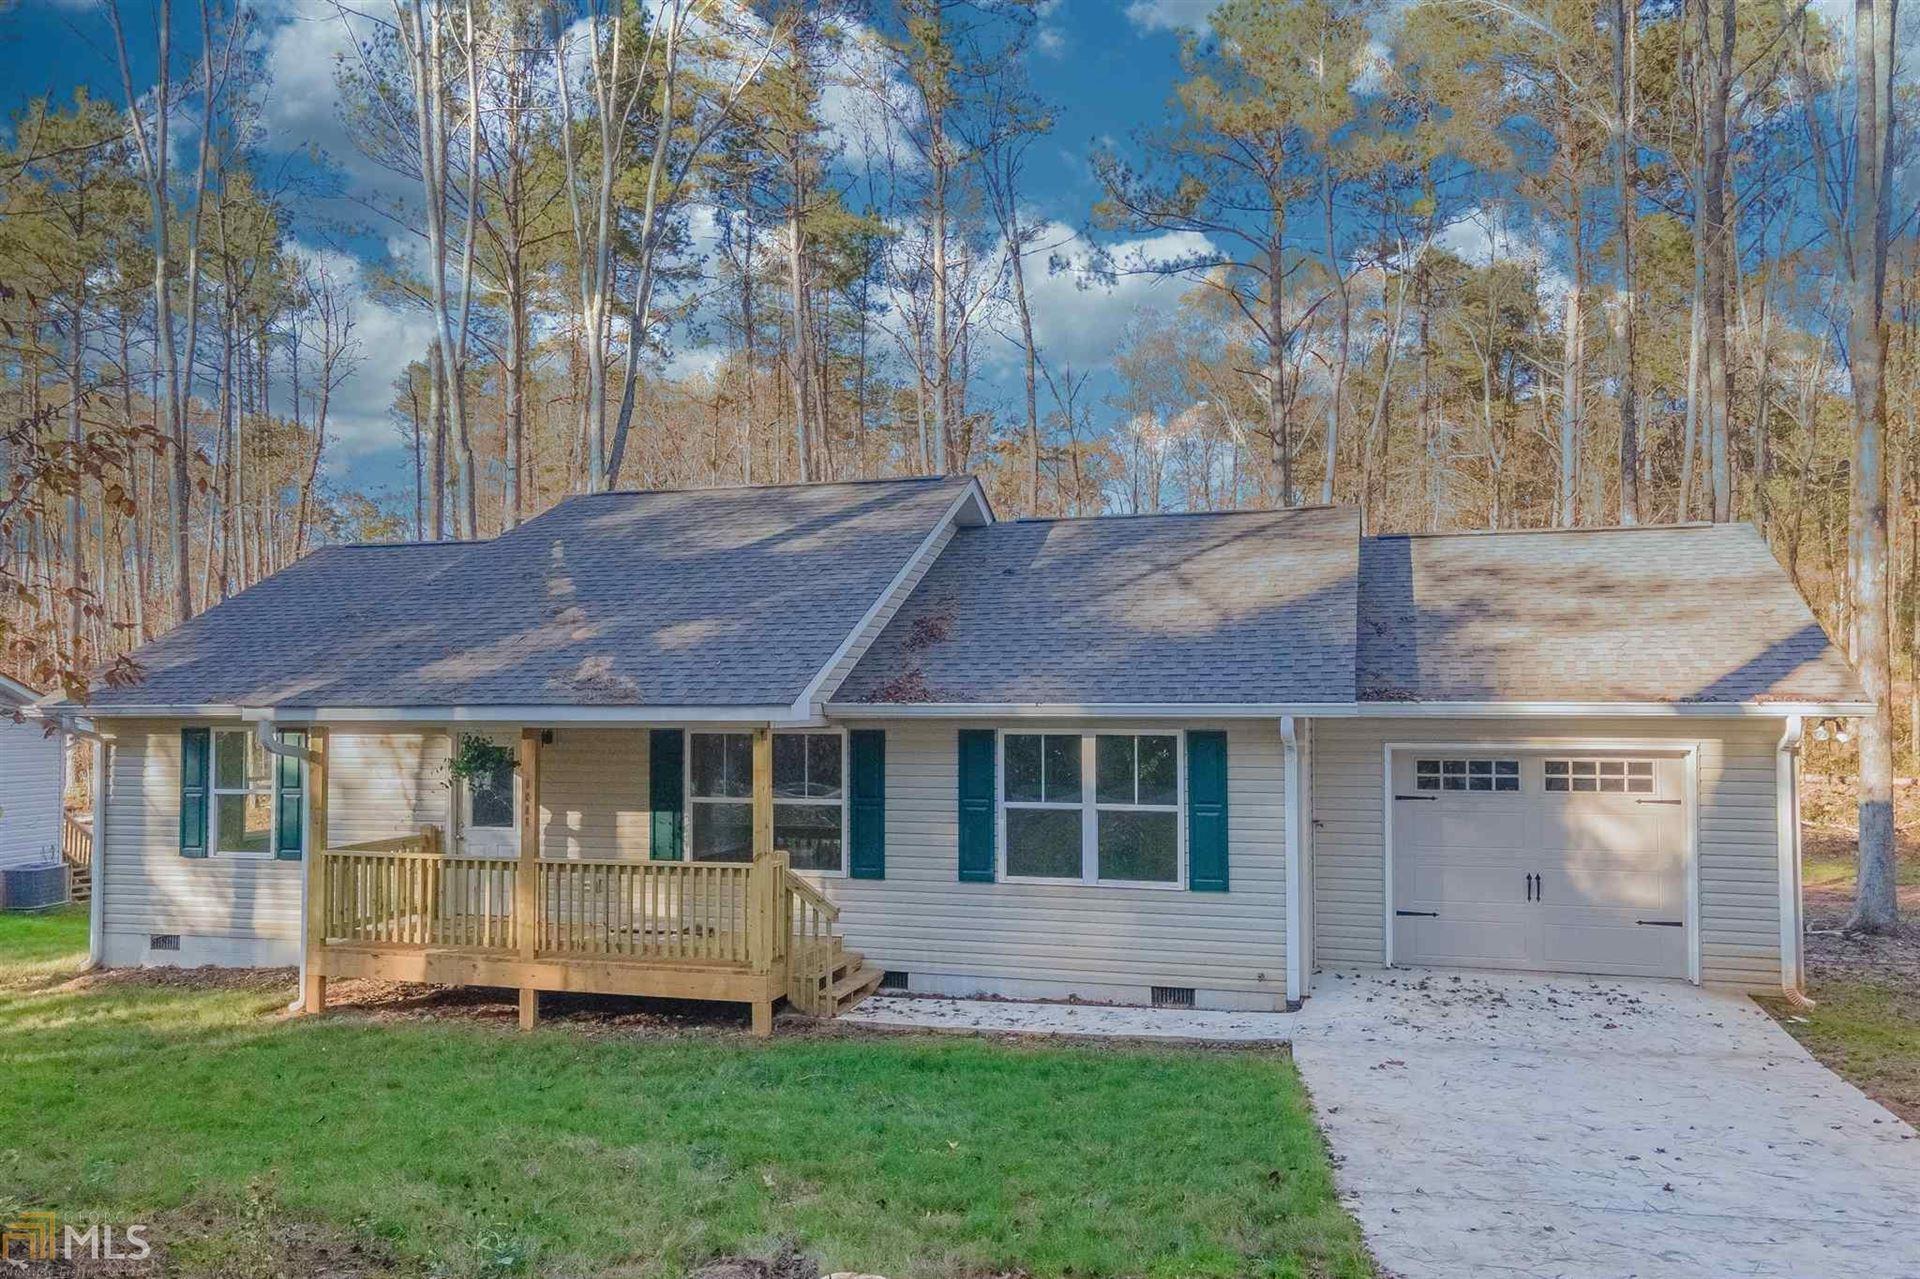 1861 Skyline Dr, Toccoa, GA 30577 - MLS#: 8889888